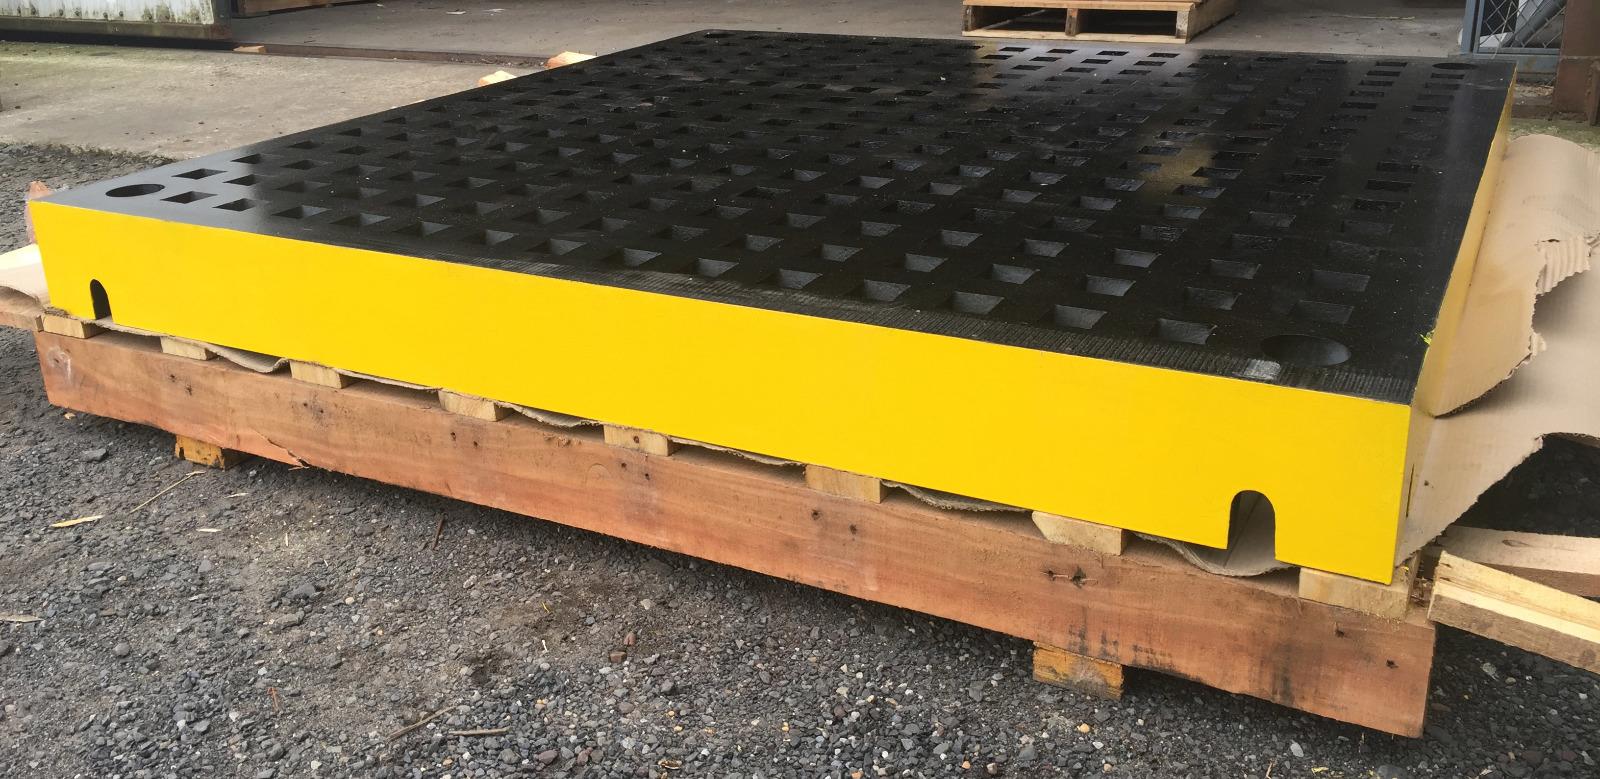 New 5 Ft X 5 Ft Welding Platen Cast Iron Layout Table 5x5